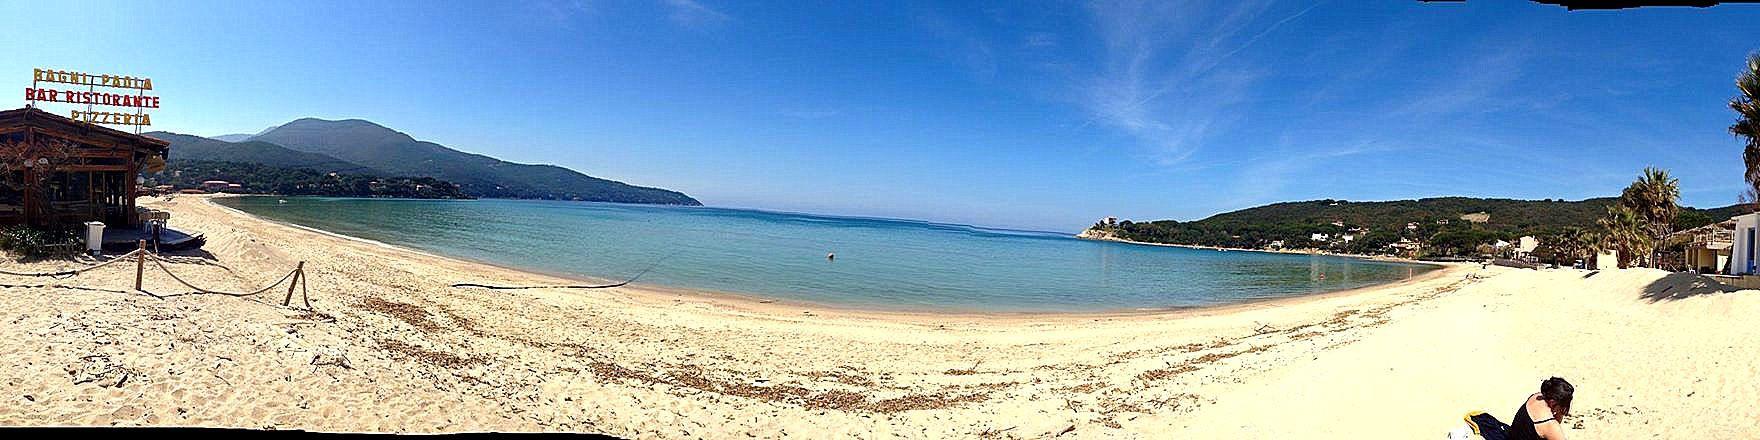 Elba, záliv Procchio